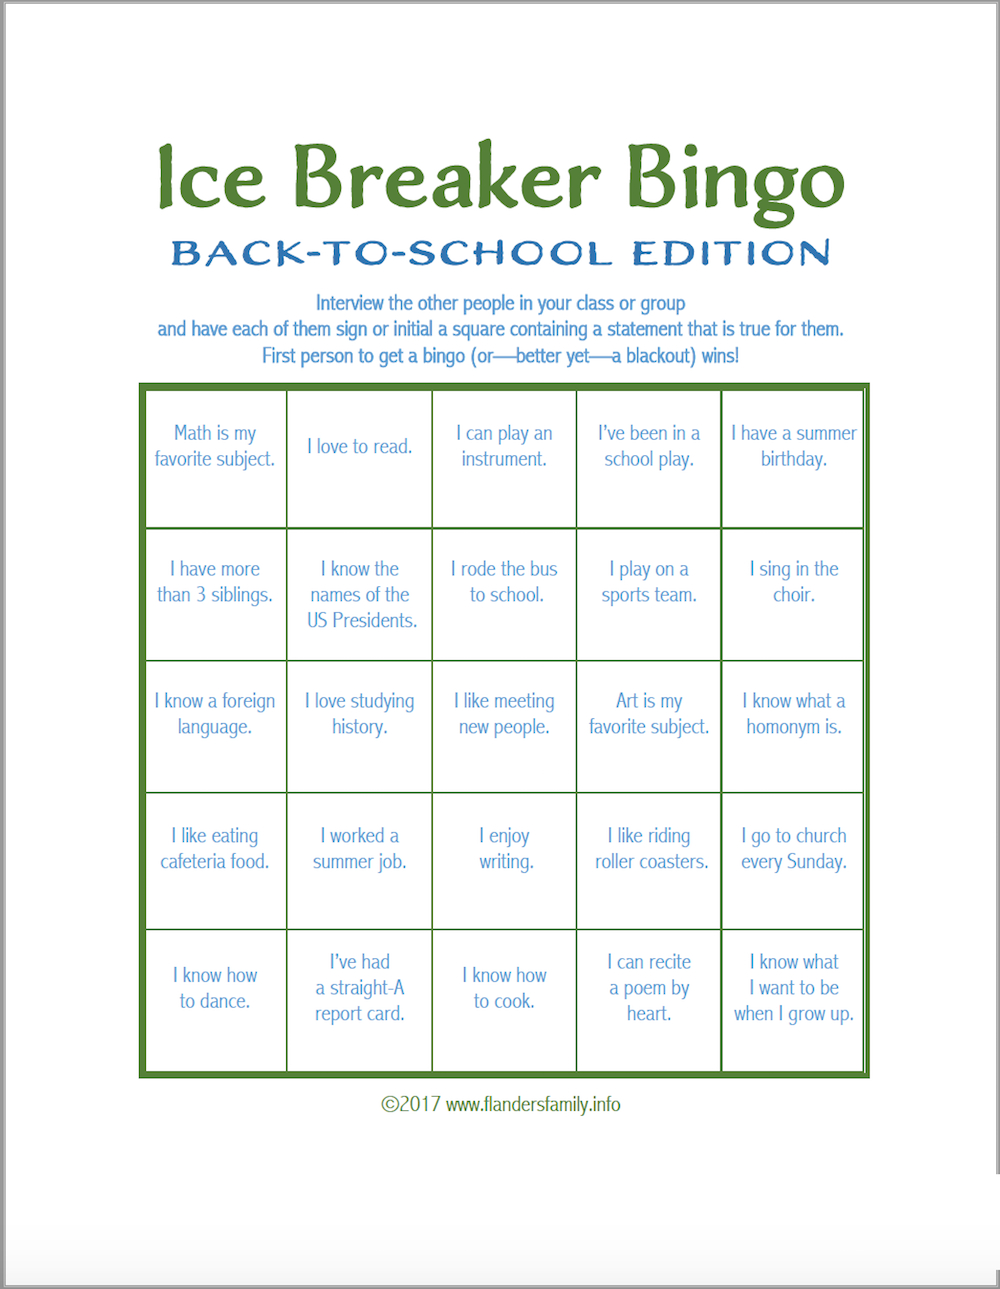 Ice Breaker Bingo: Back-To-School Version - Flanders Family